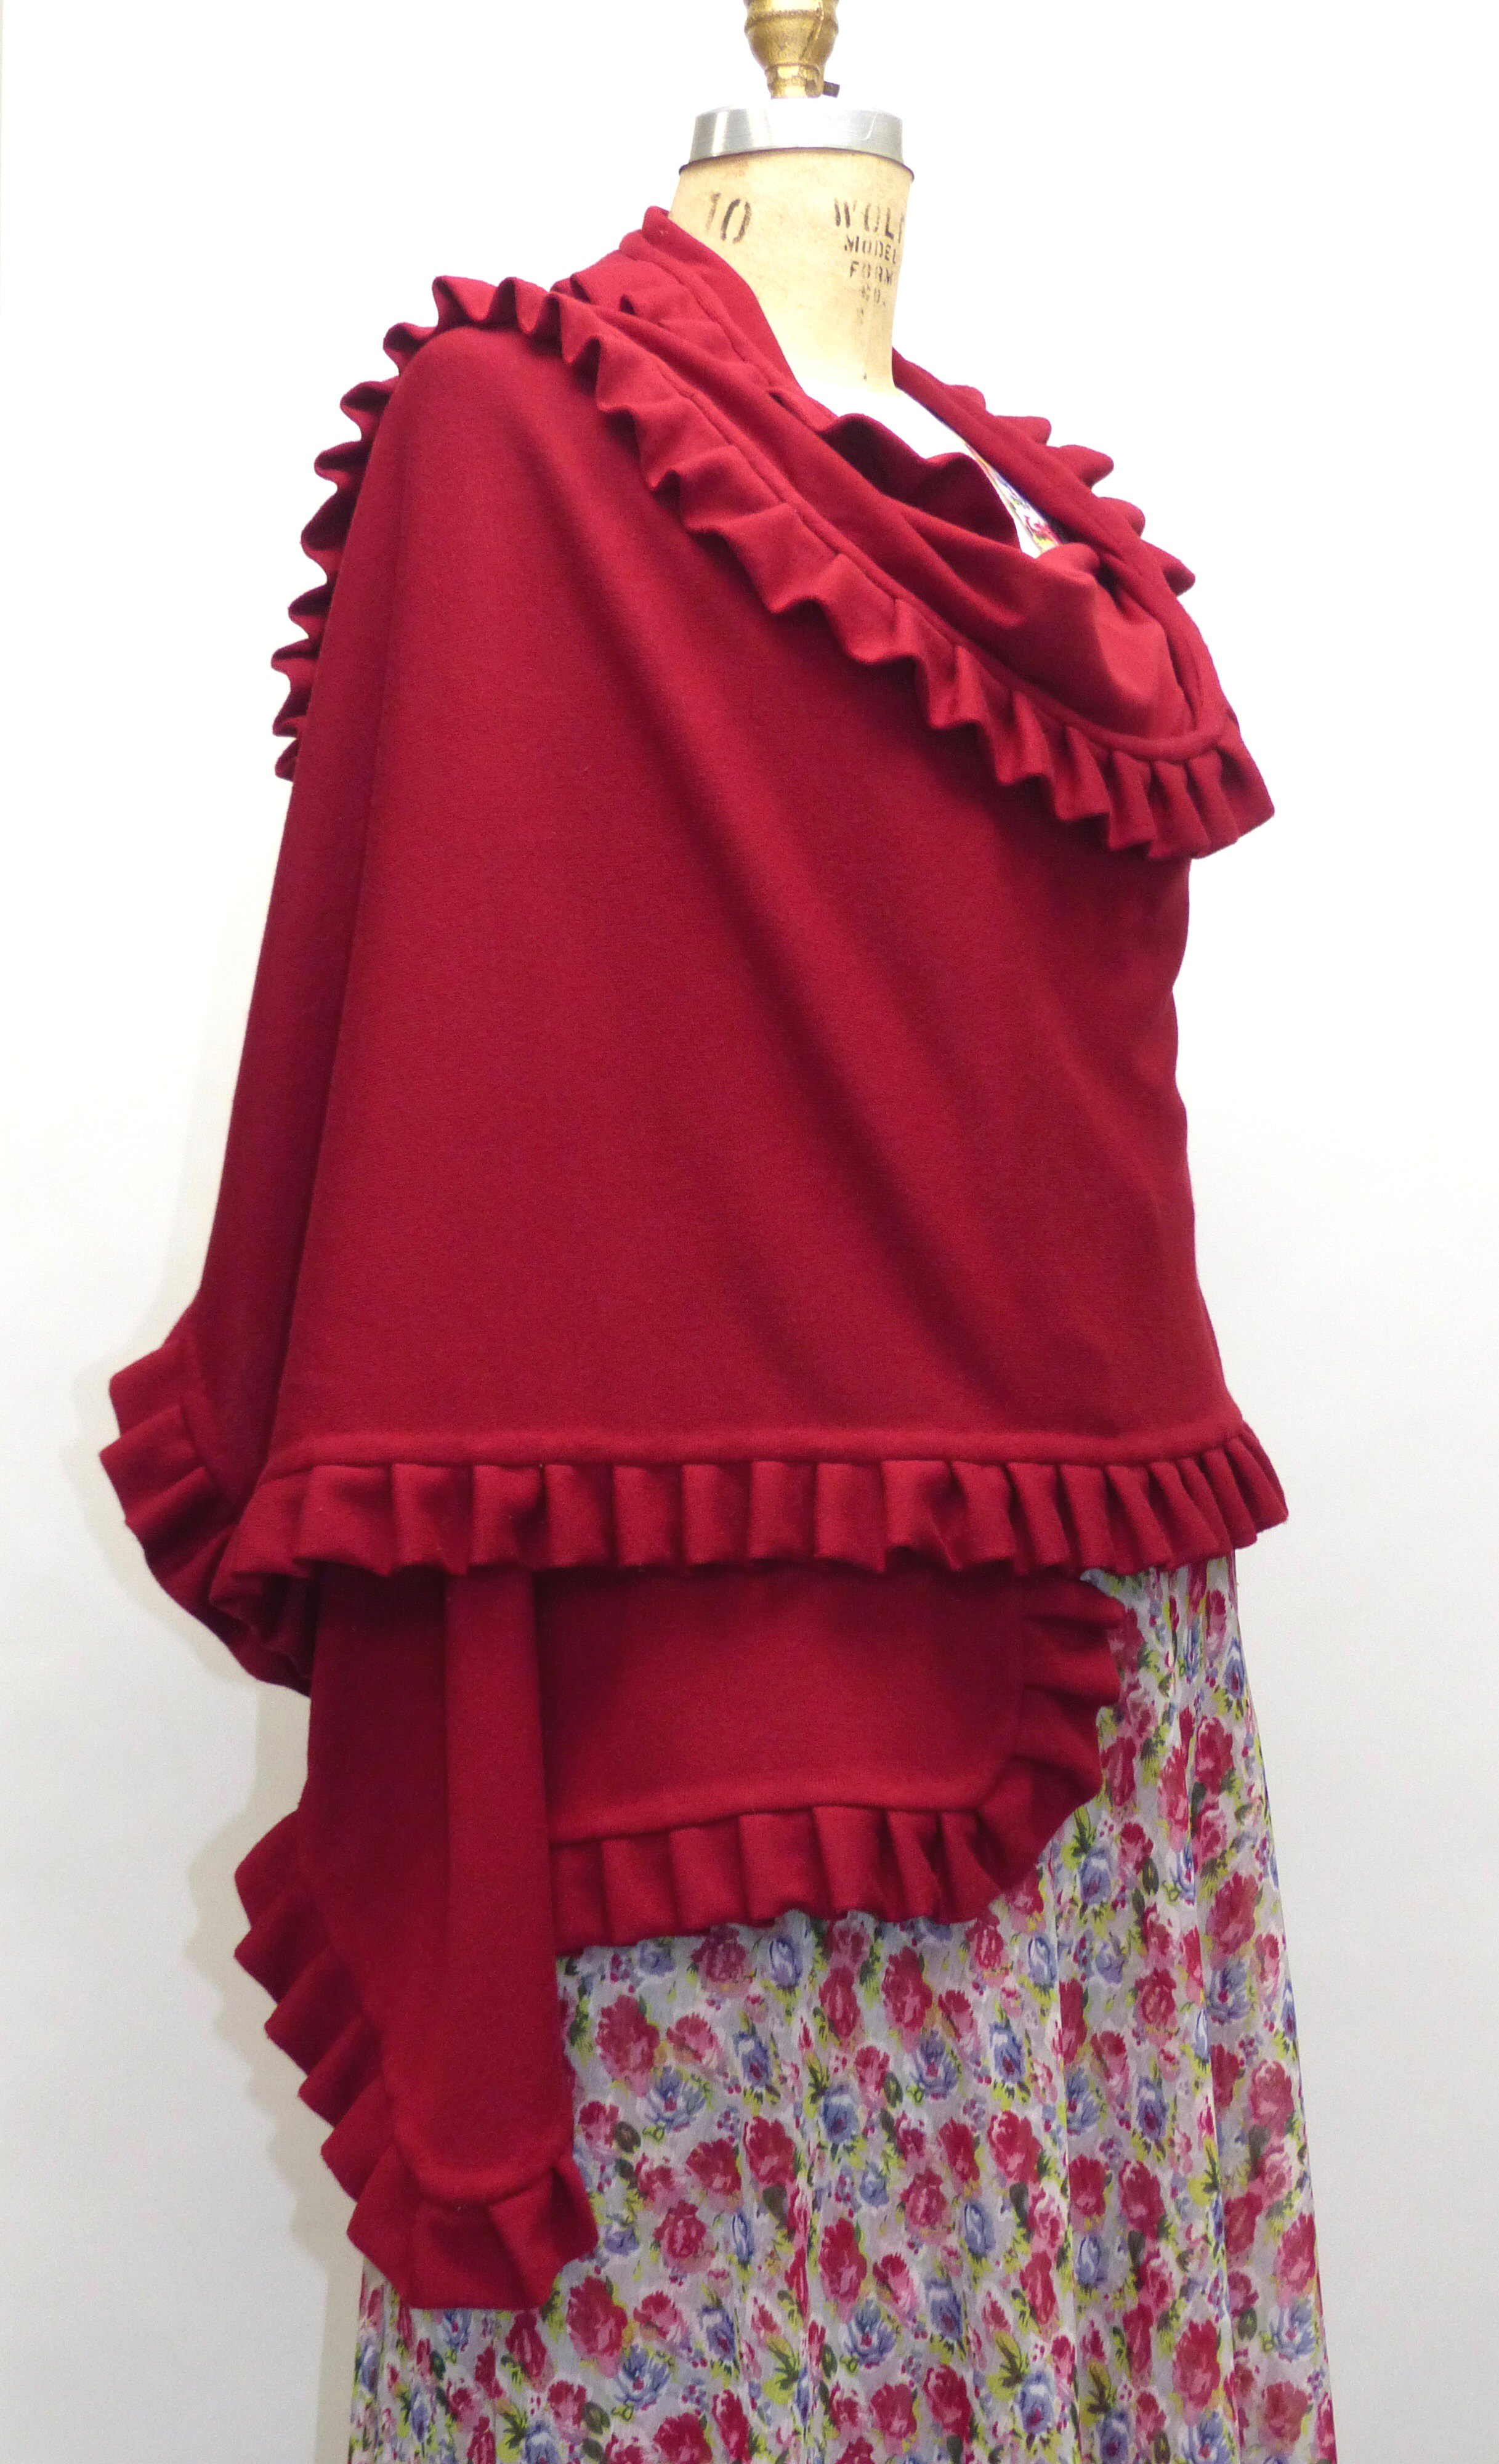 100 Bulk Hemline Non Sew Self Cover Metal Top Buttons Fabric Garments 29 mm